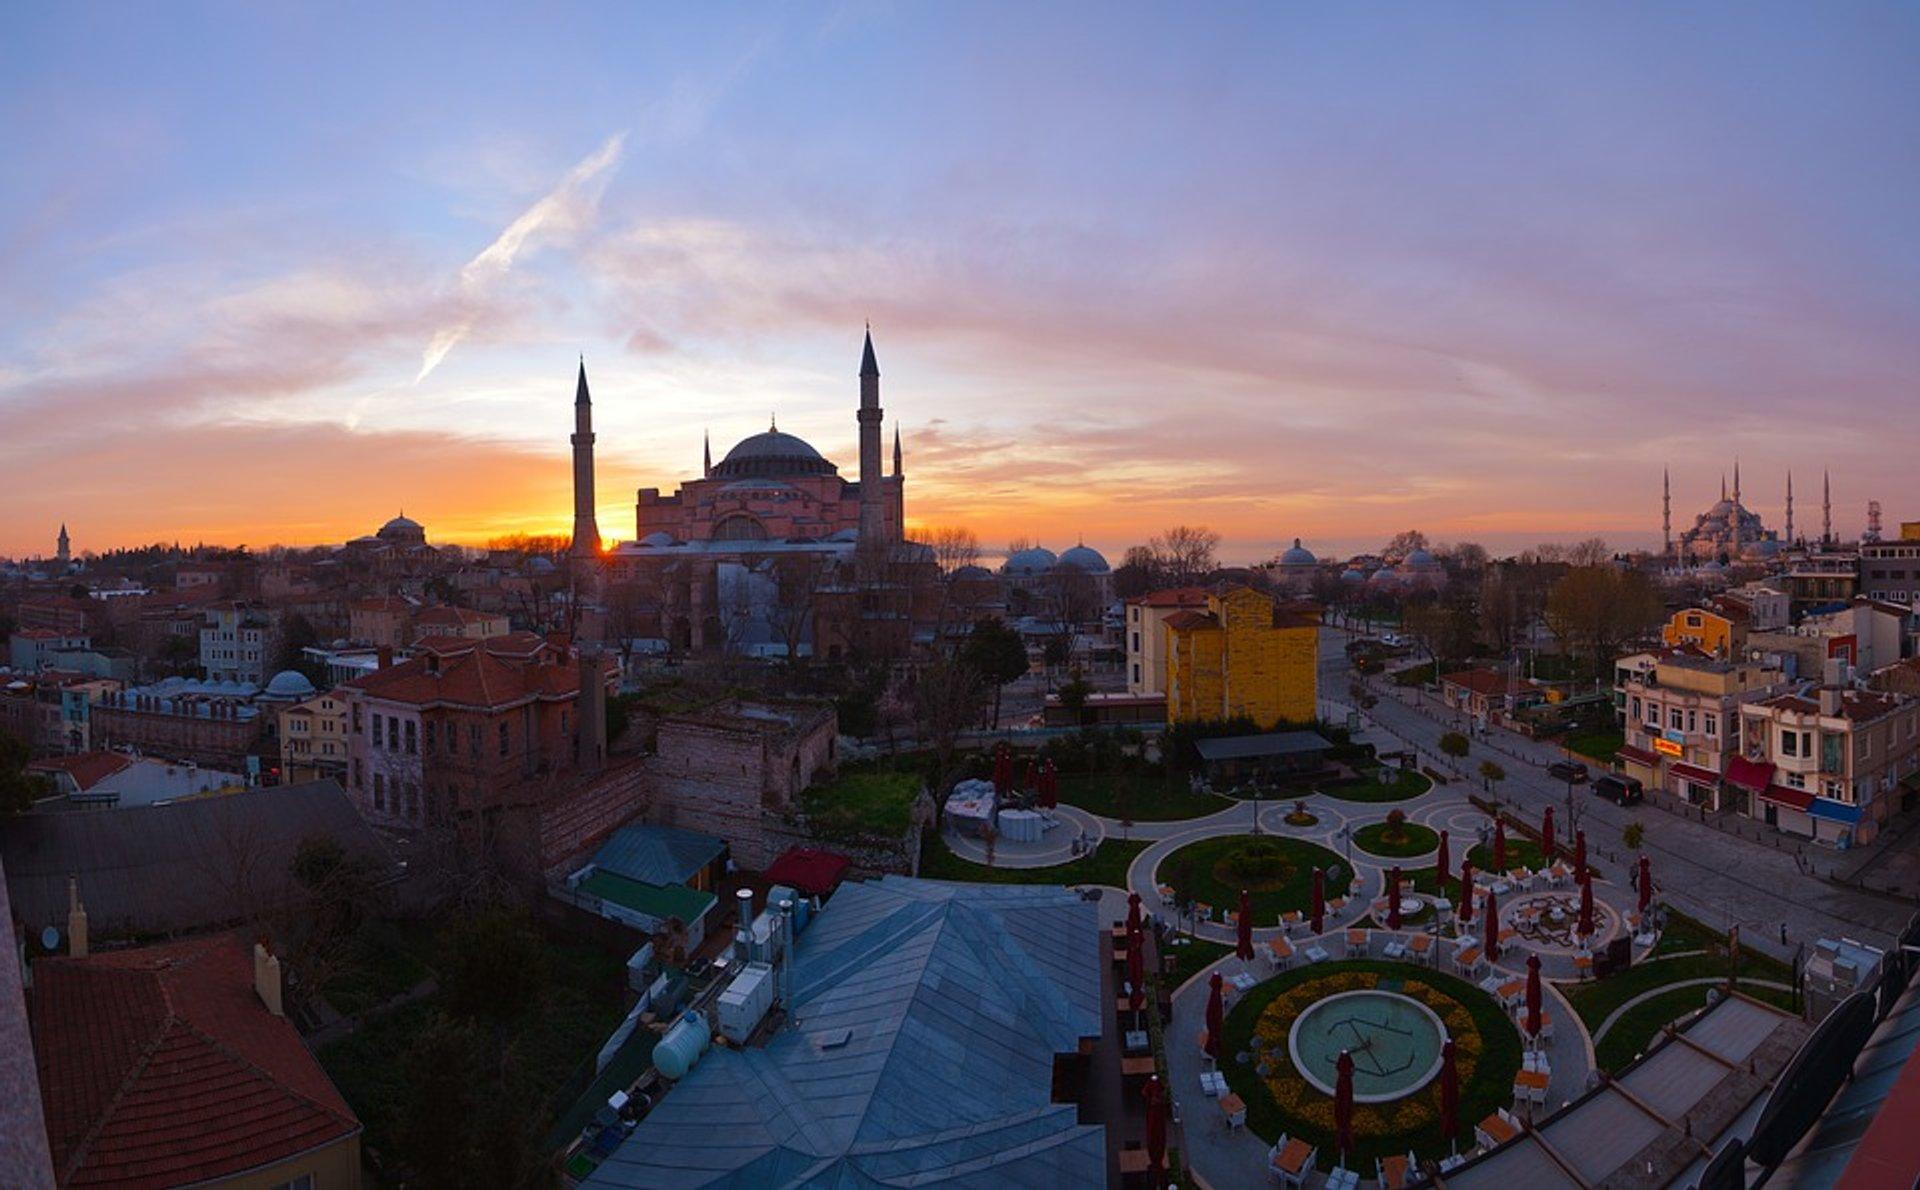 Hagia Sophia (Ayasofya) in Istanbul - Best Season 2020